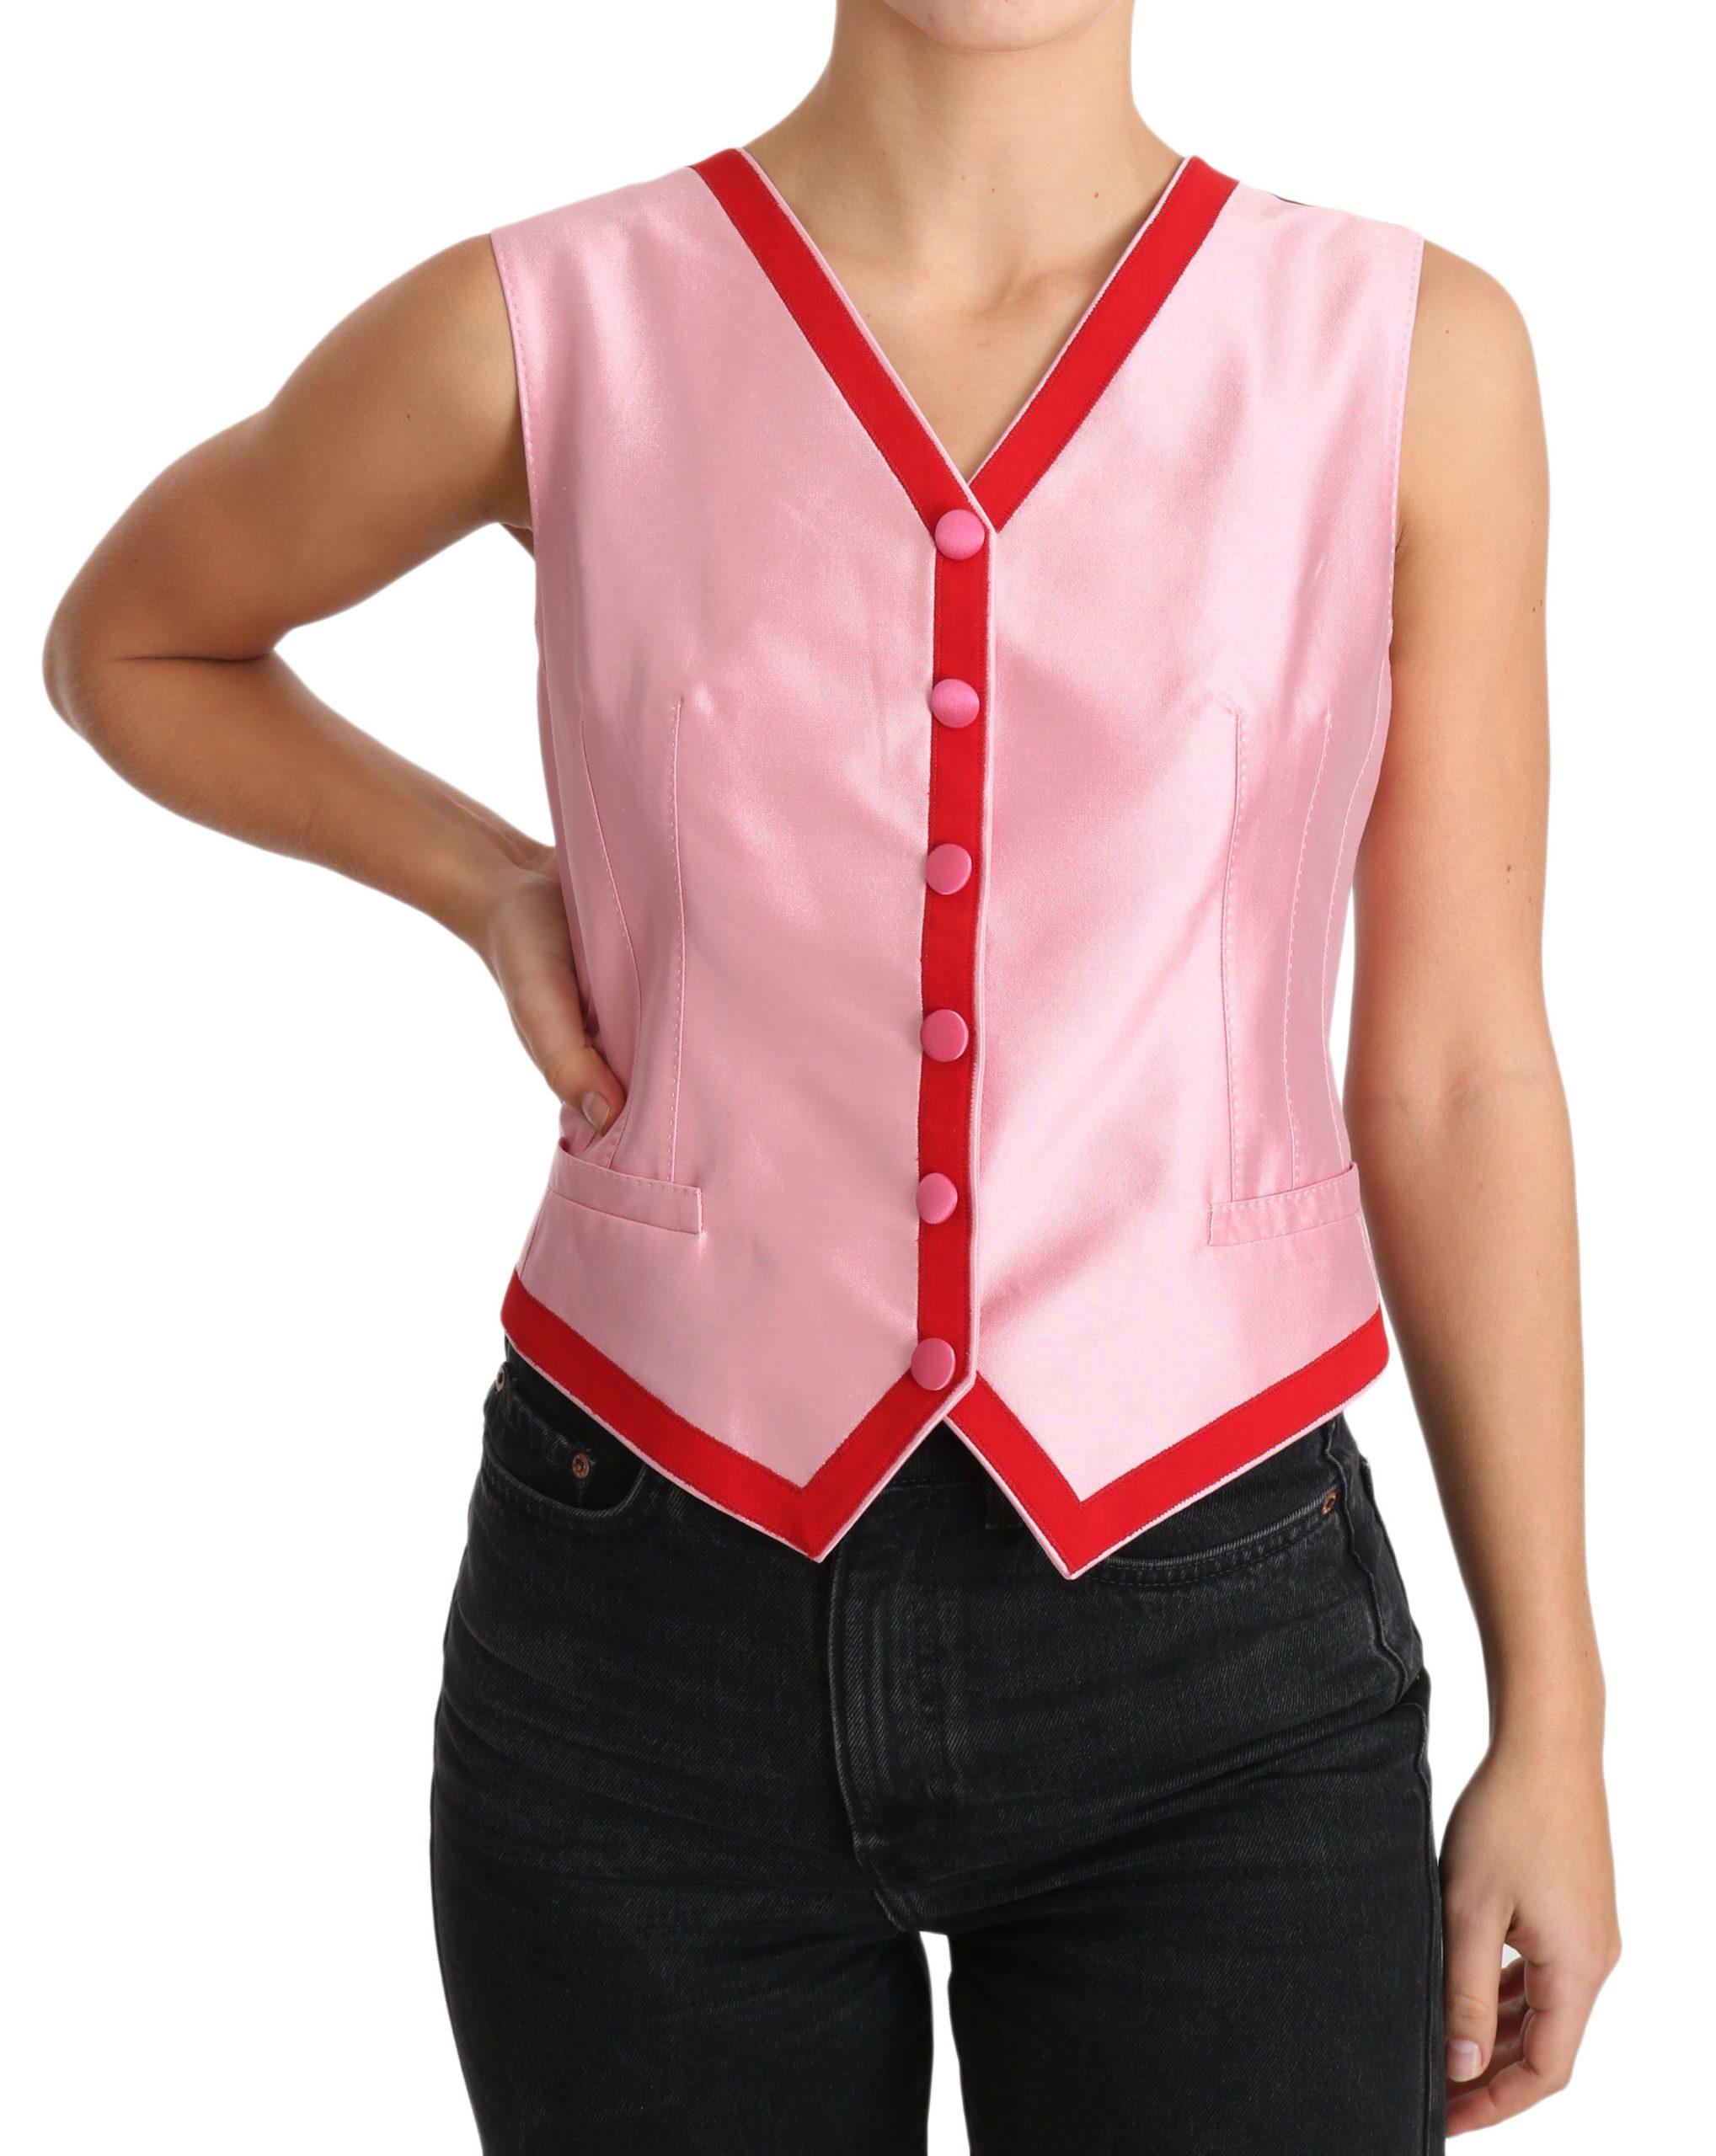 Dolce & Gabbana Women's V-neck Sleeveless Top Pink TSH3406 - IT42|M